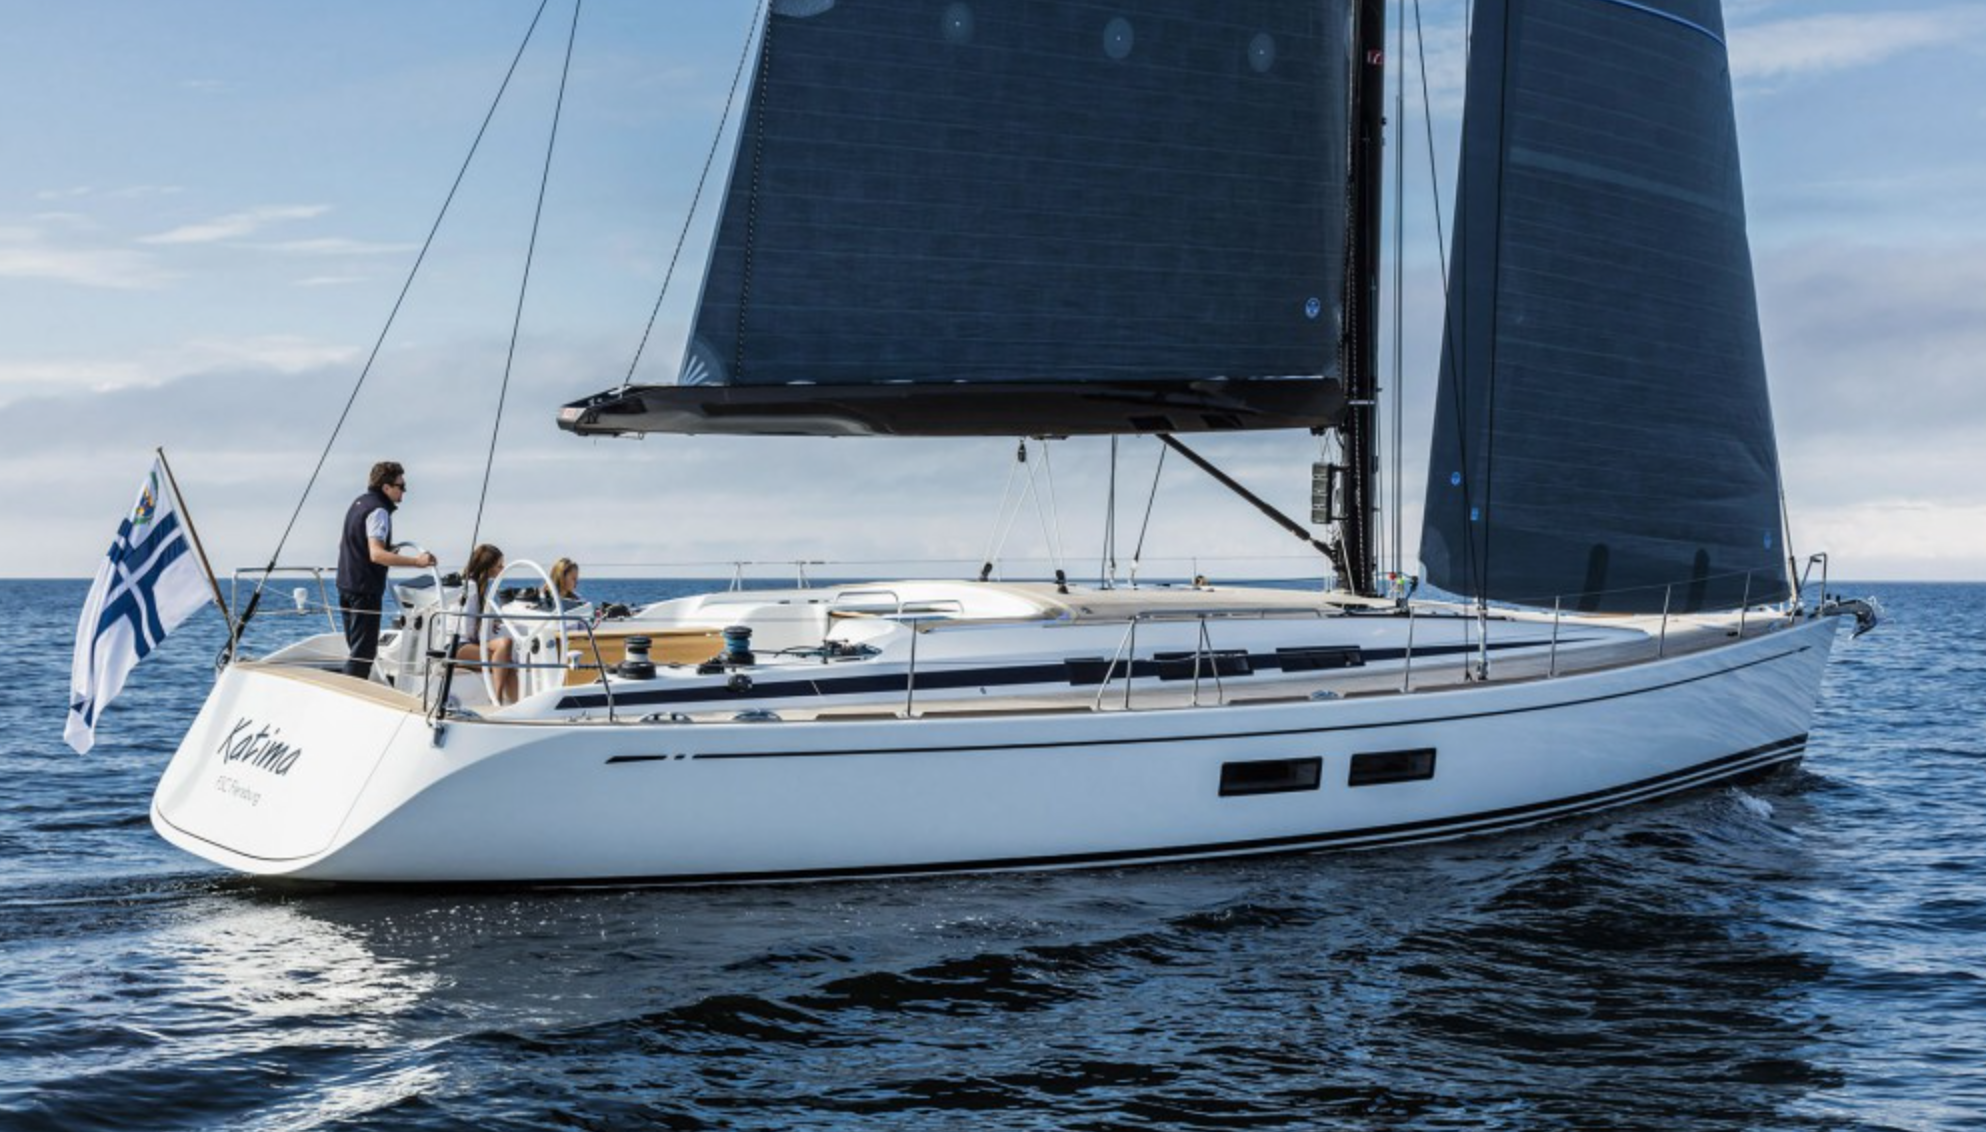 Nautor`s Swan 54. A dream yacht for many. Photo: Nautors Swan